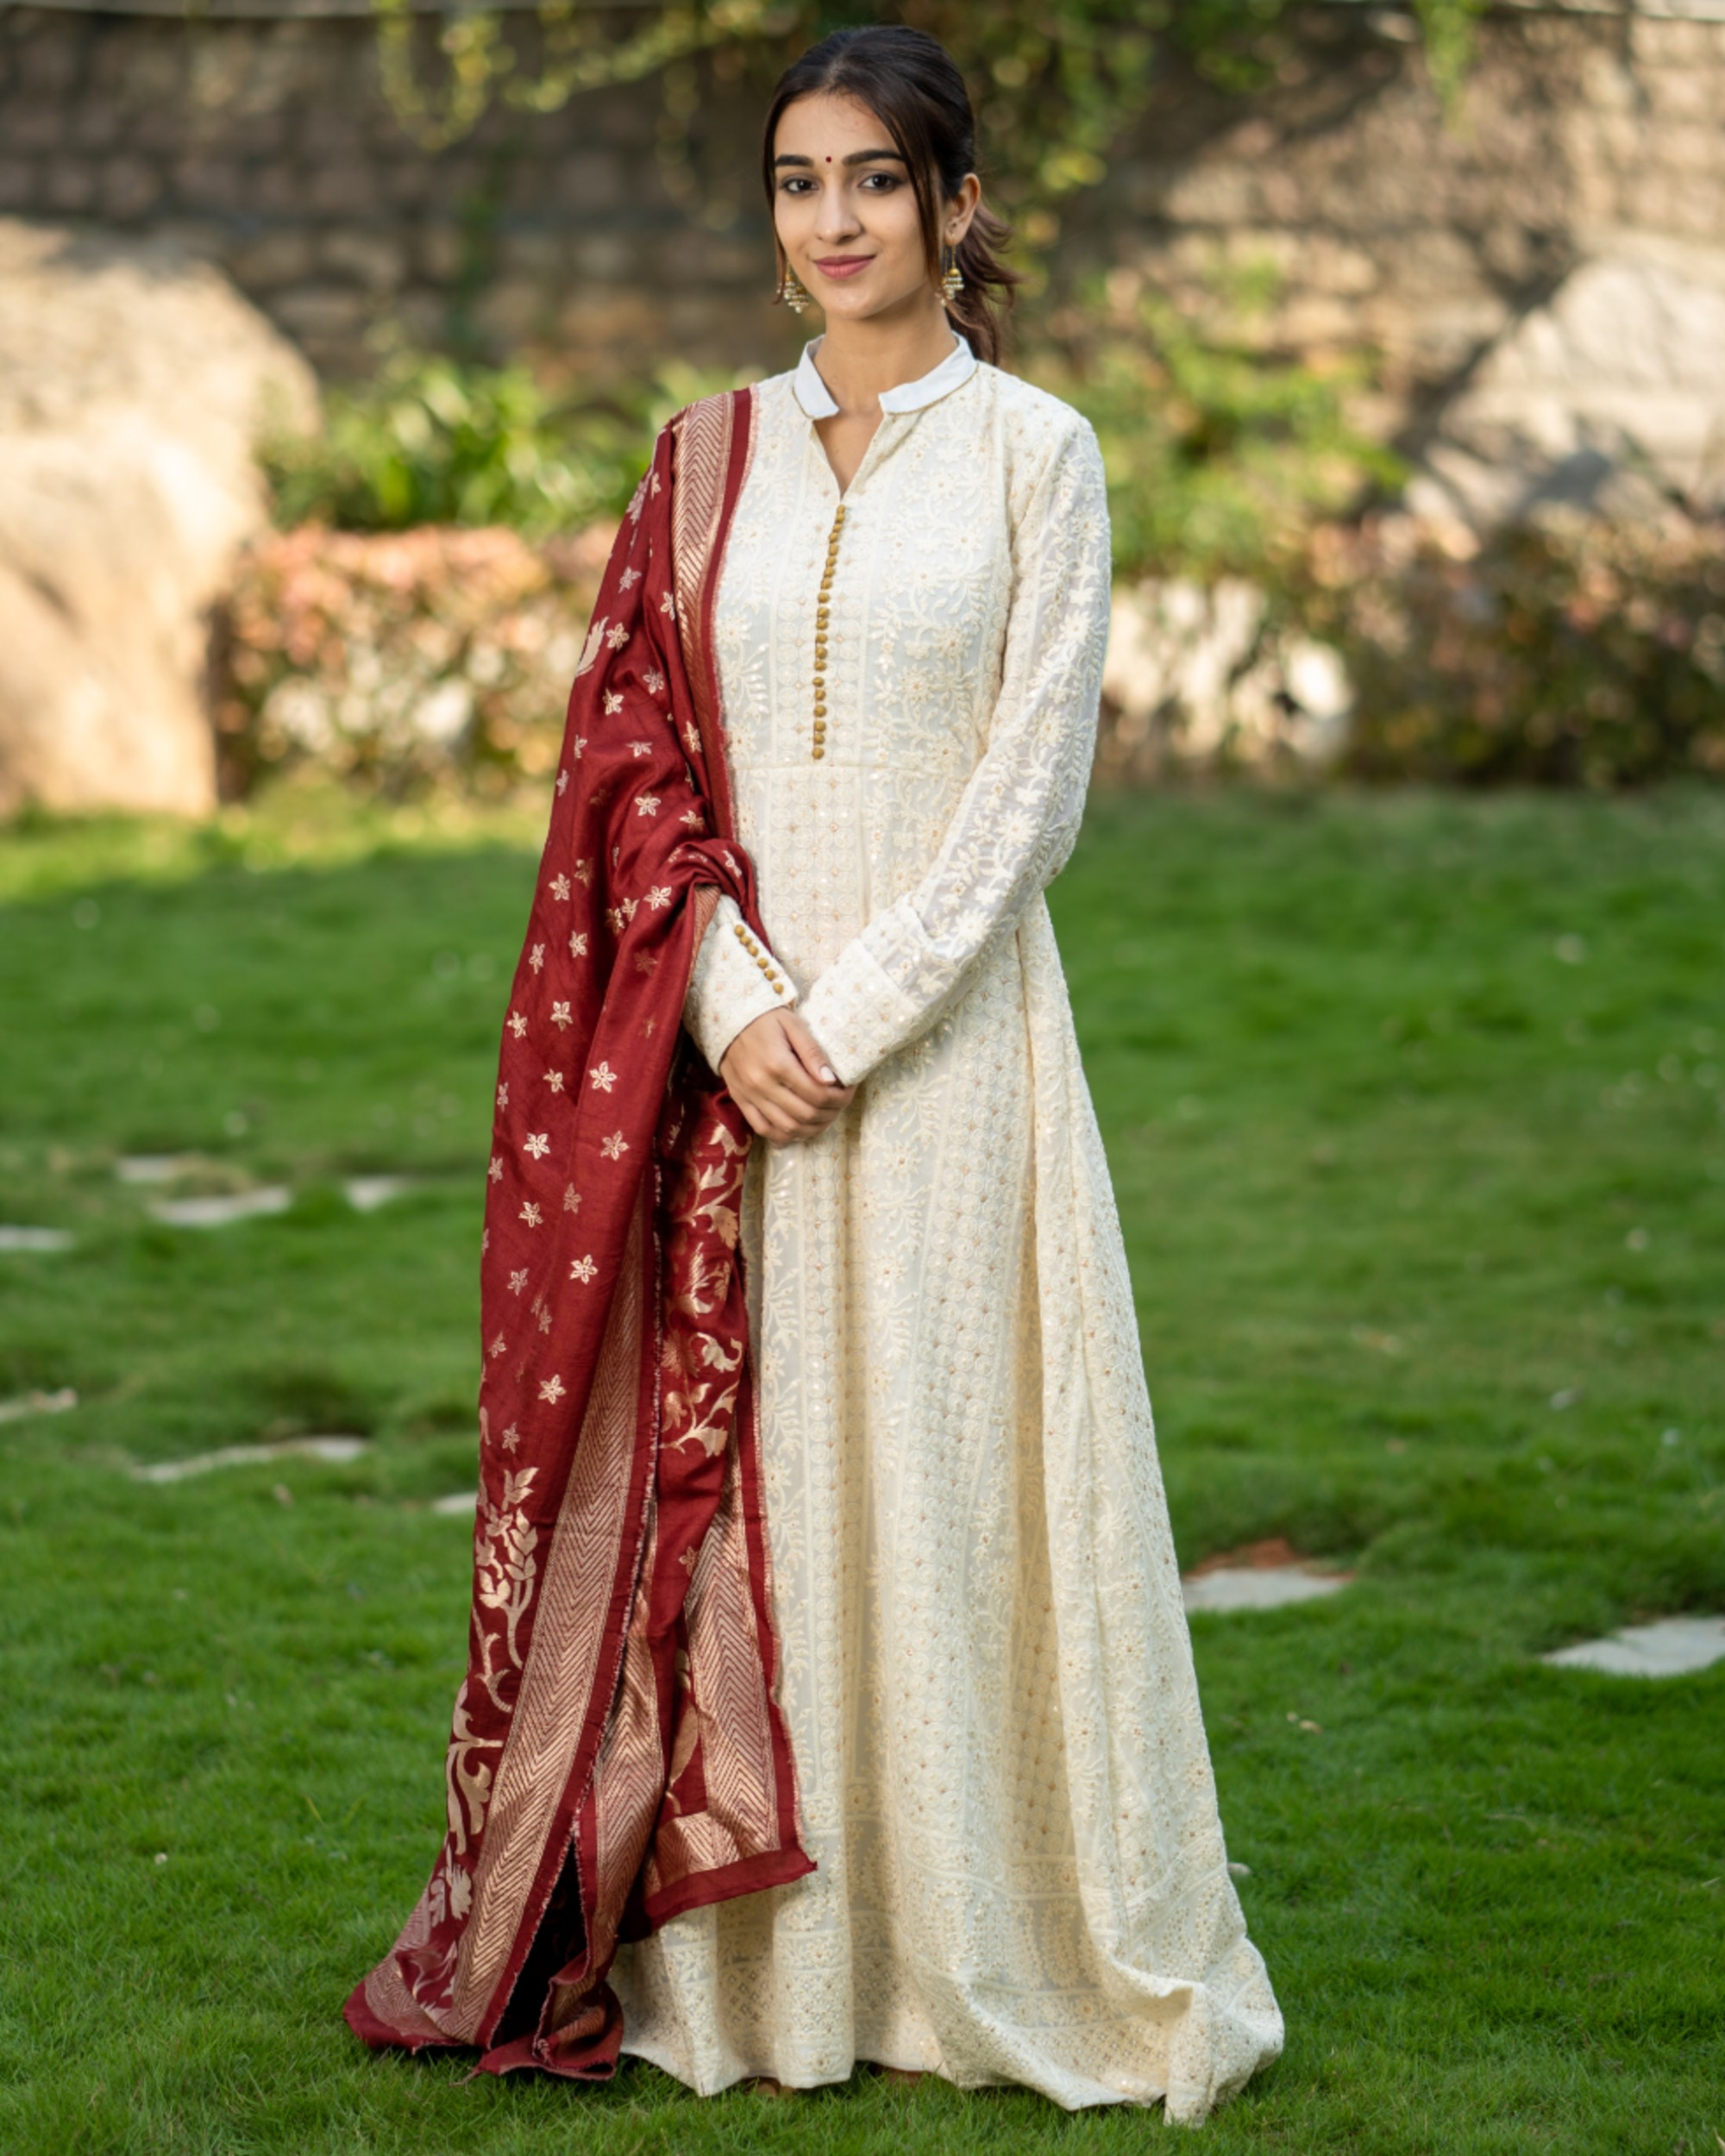 Off white embroidered dress and maroon banarasi dupatta set- set of two